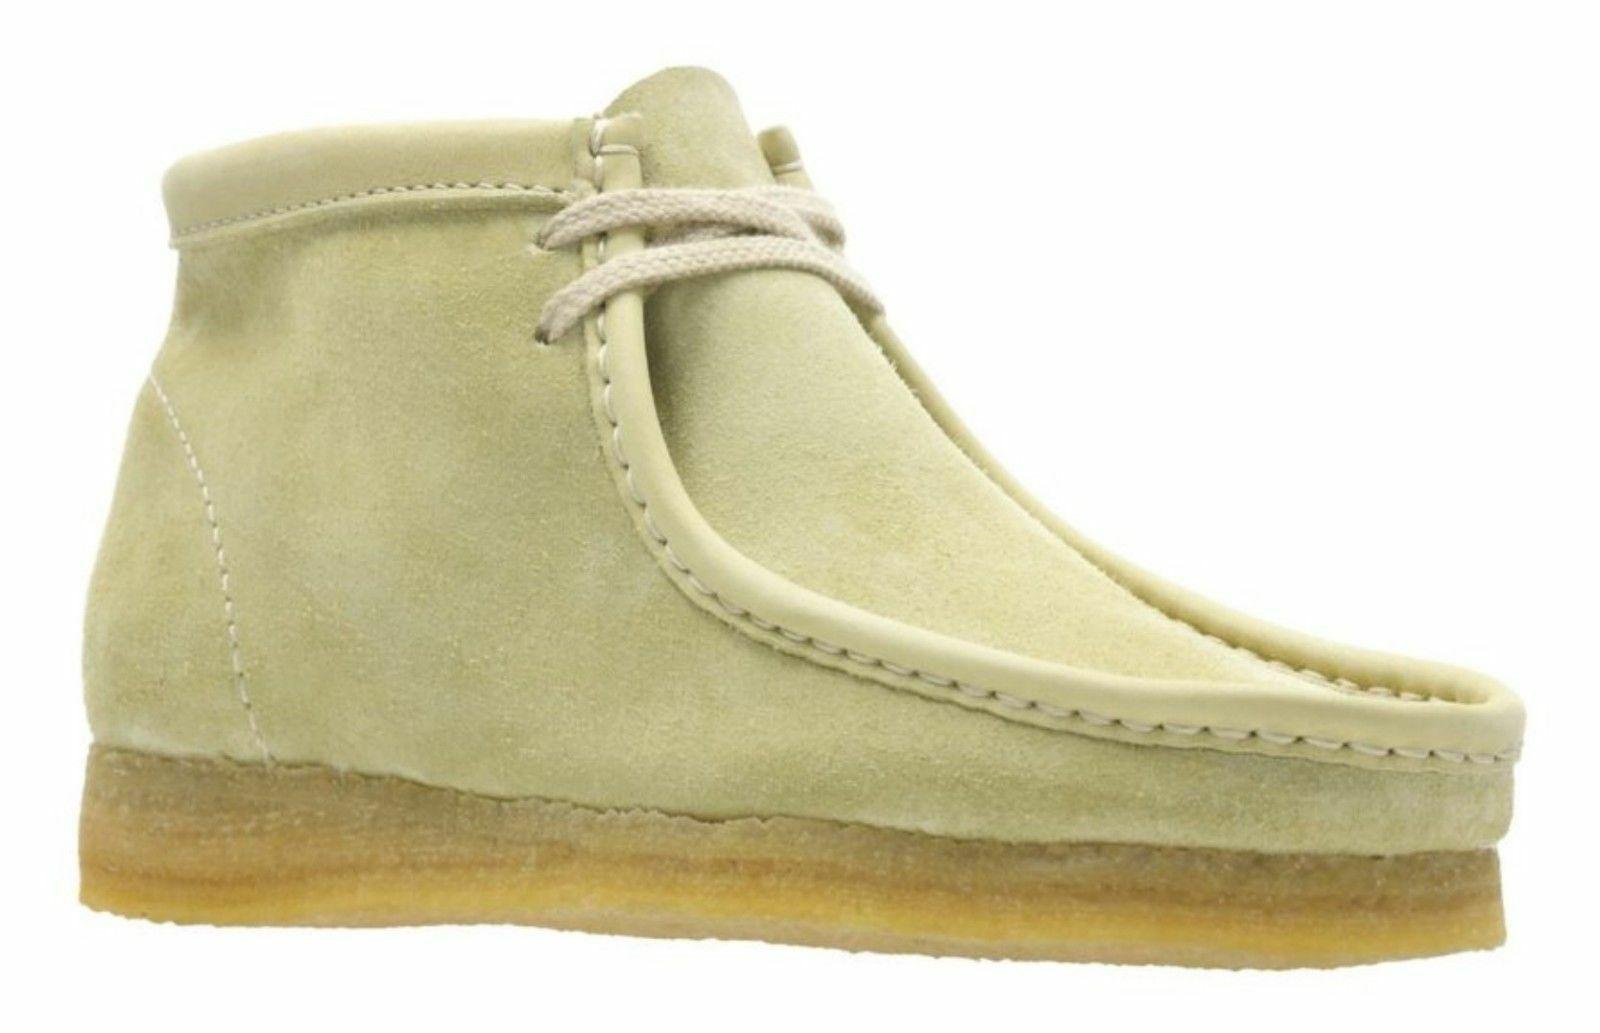 Clarks Originals Wallabee Boots Men's Maple Suede 26133283